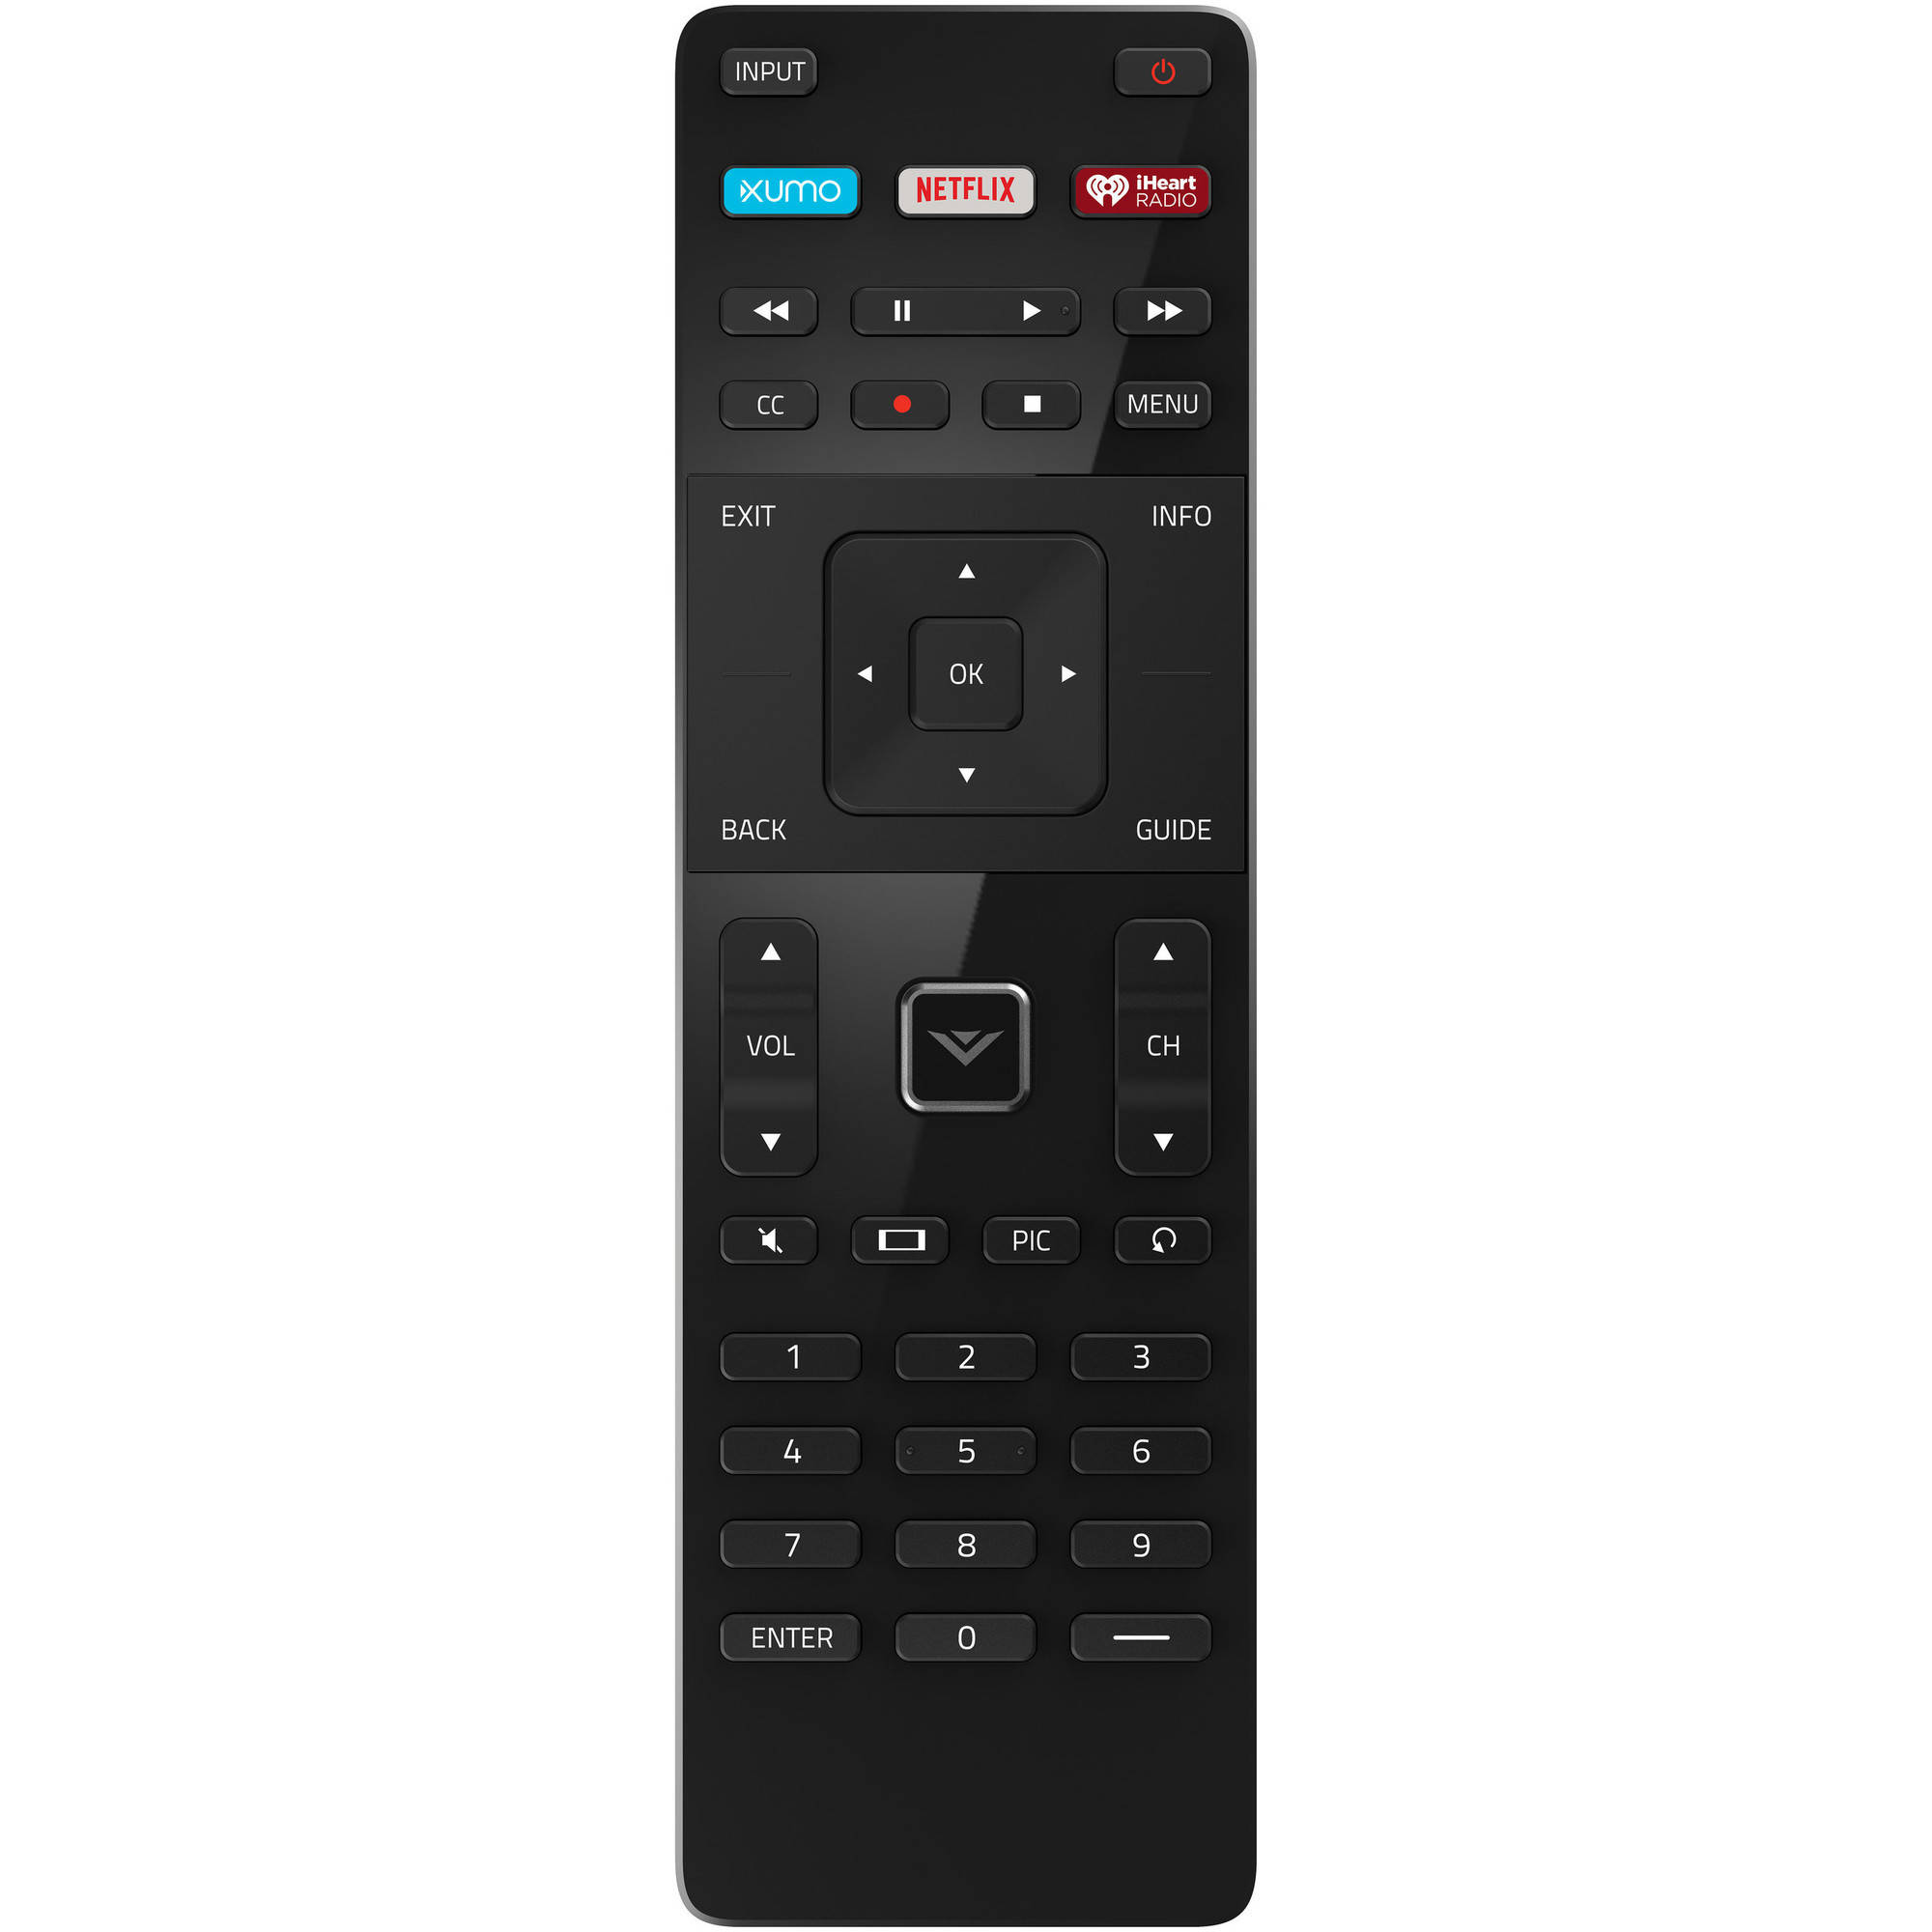 vizio 43 class fhd 1080p smart led tv d43f e2 walmart com rh walmart com Sprint LG User Guide LG Optimus Operating Manual